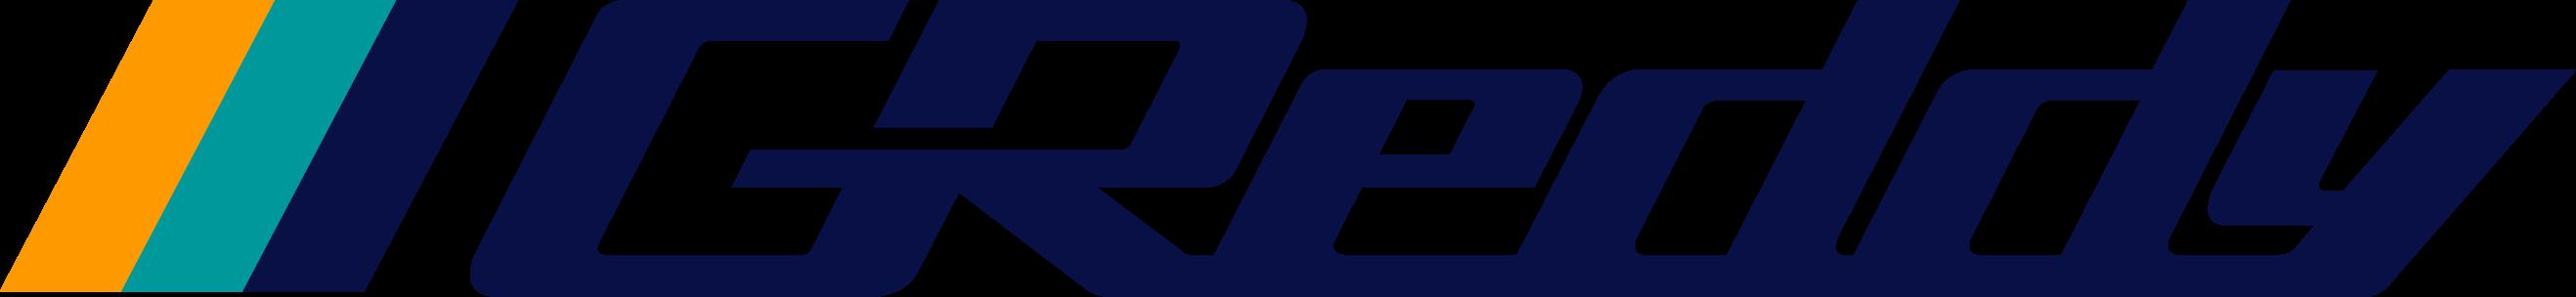 greddy-logo-1-.png